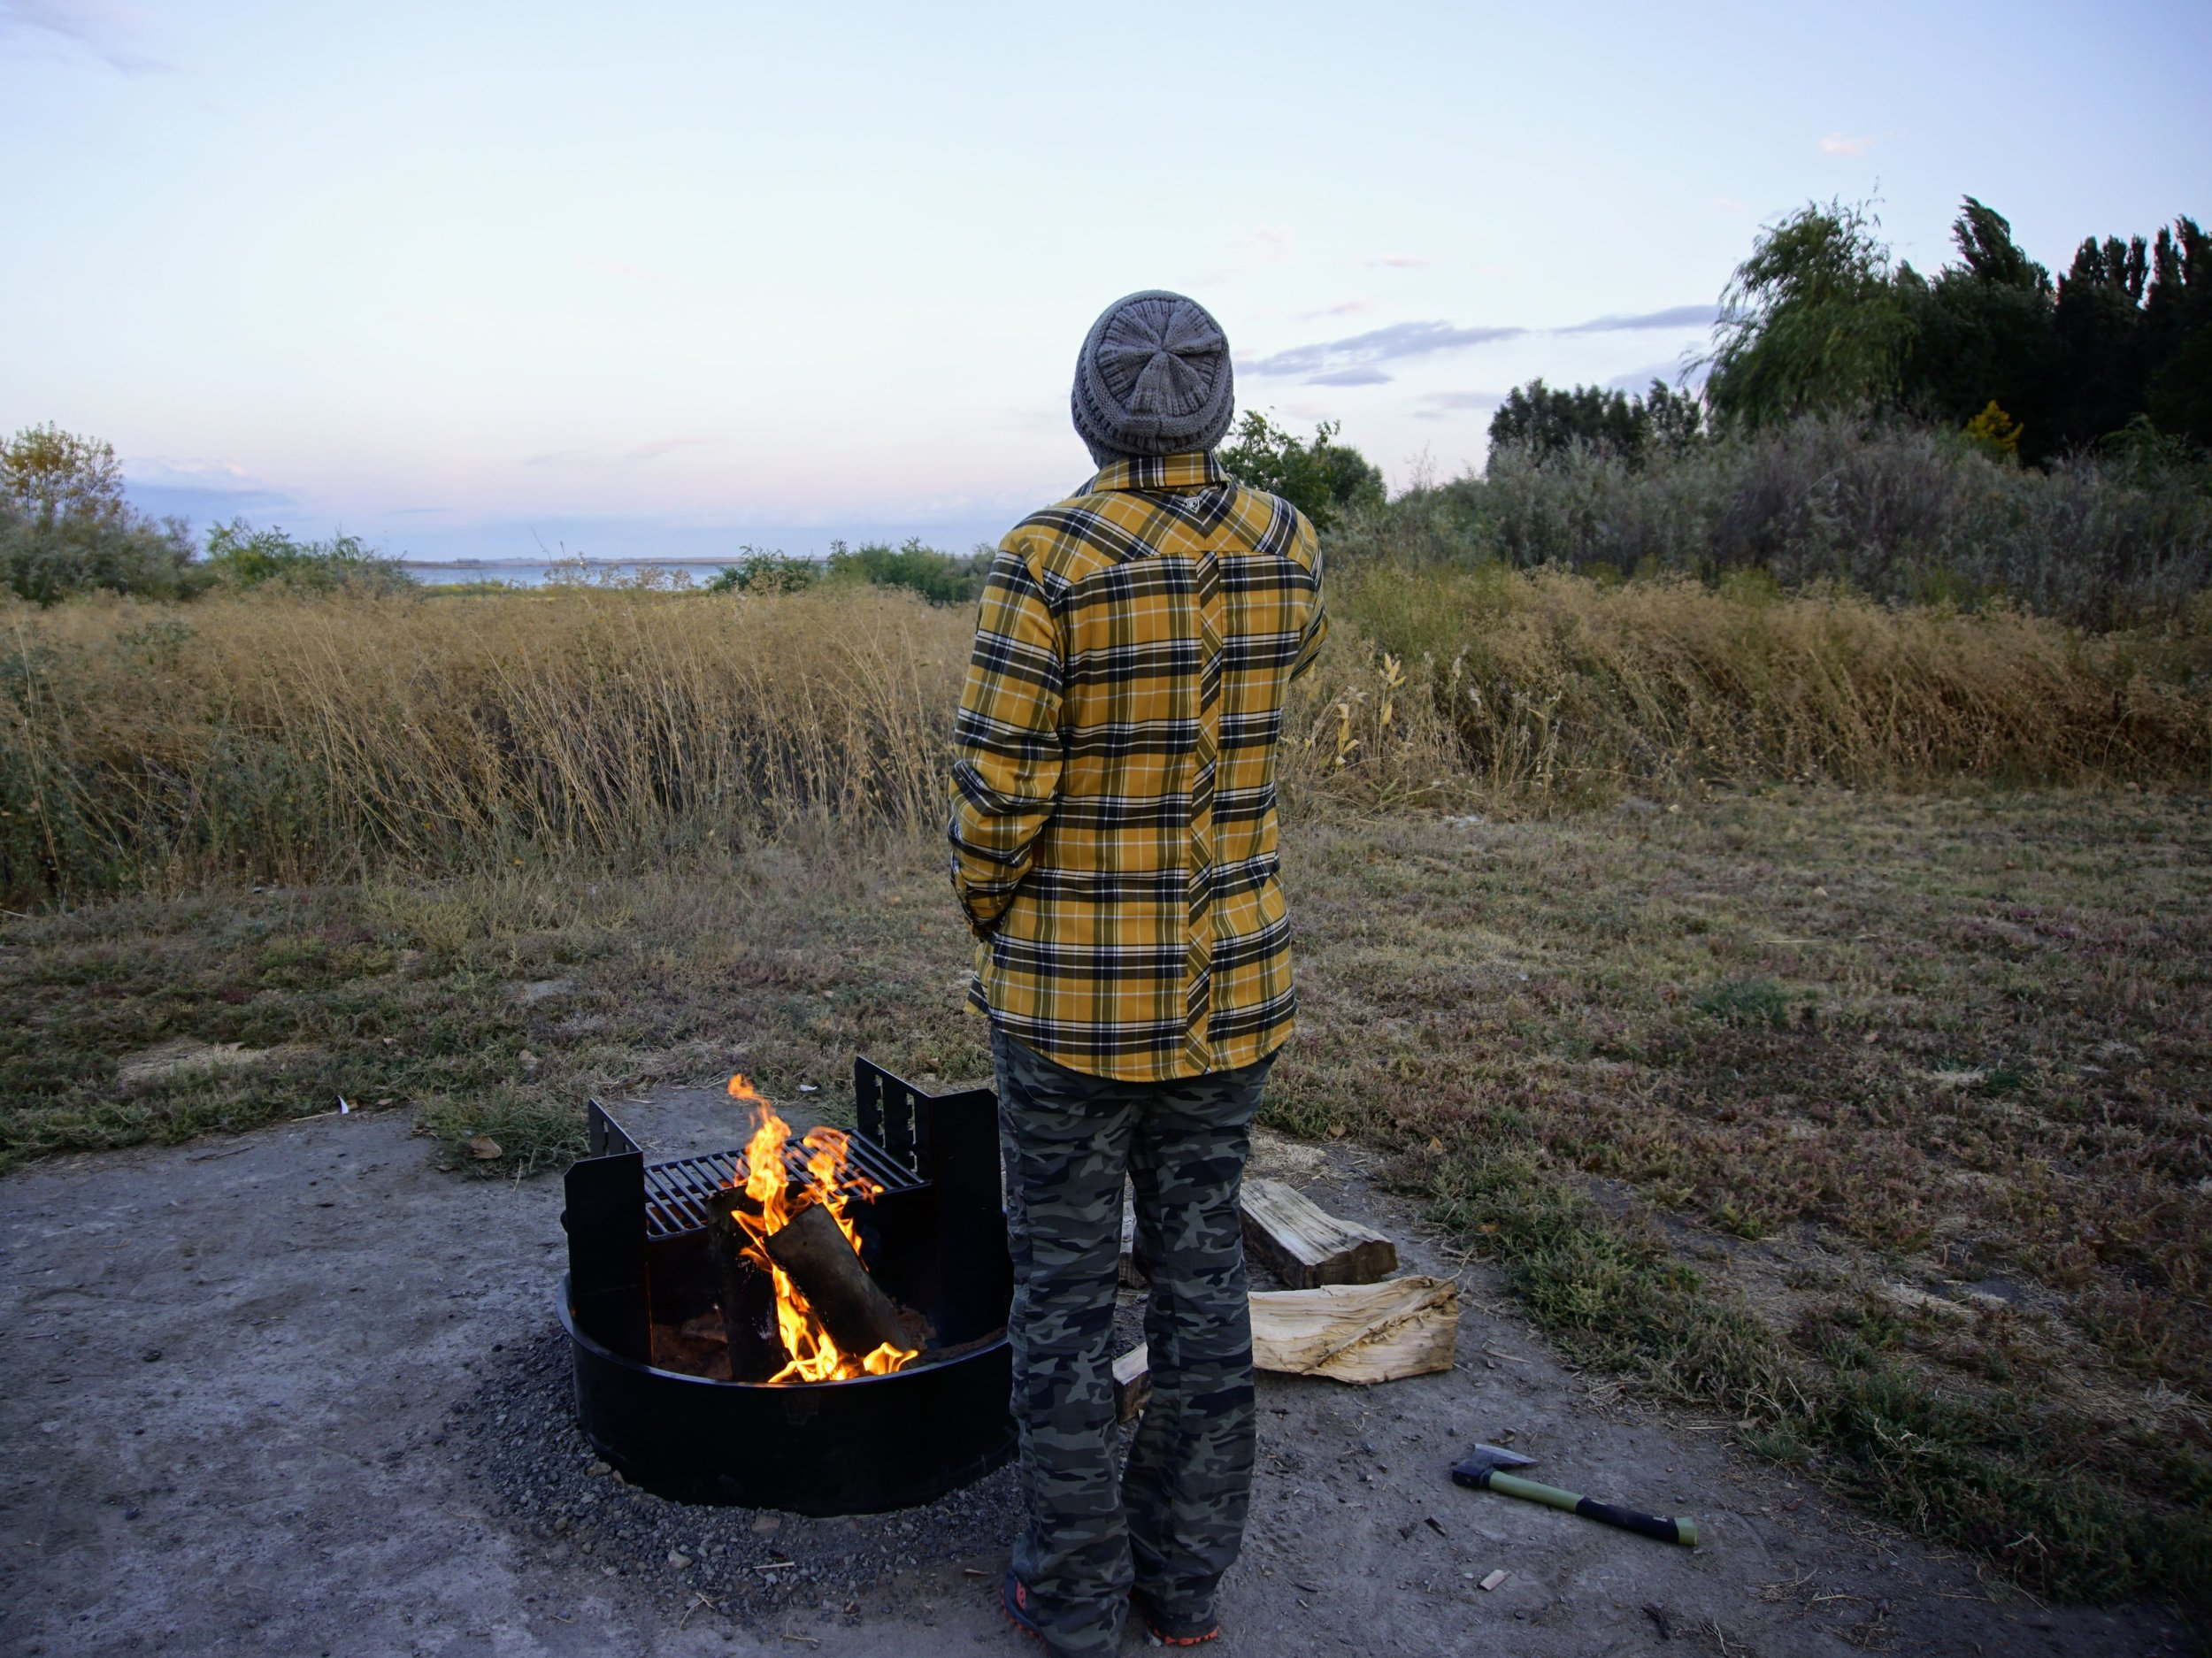 Campfire at Potholes State Park